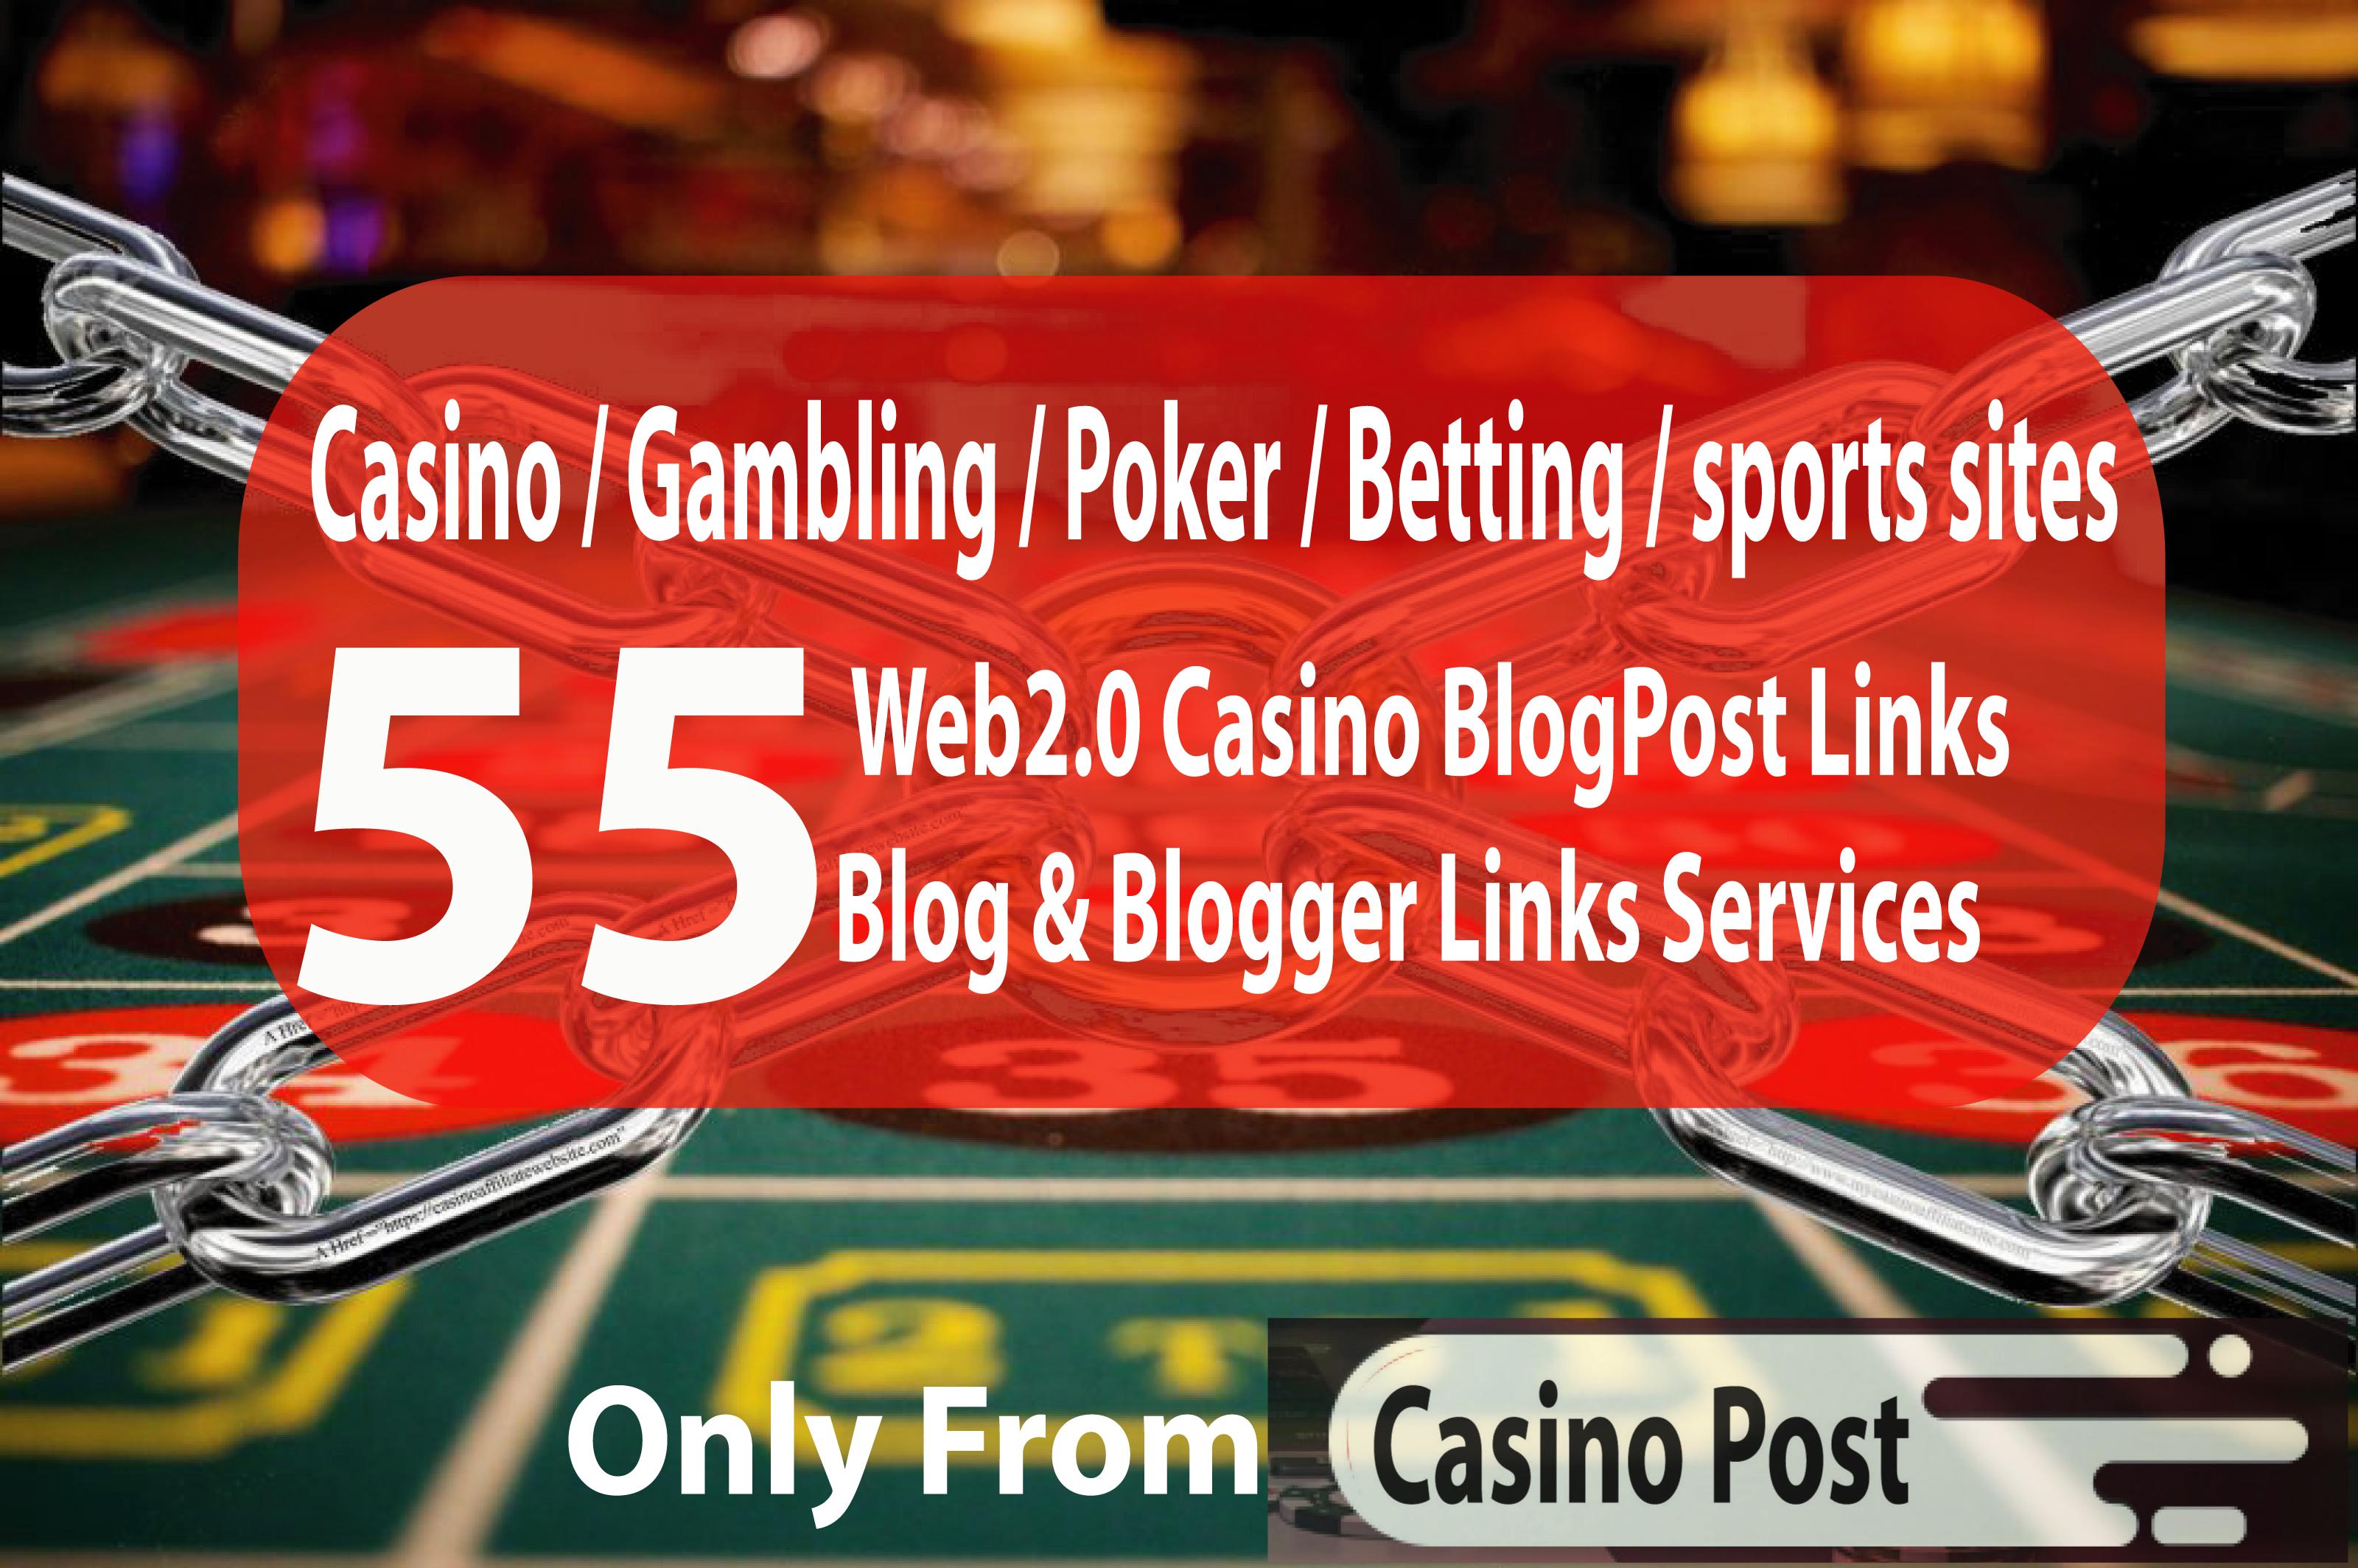 55 Advance Casino Blogpost- Casino / Gambling / Poker / Betting / sports sites From Web2.0 site